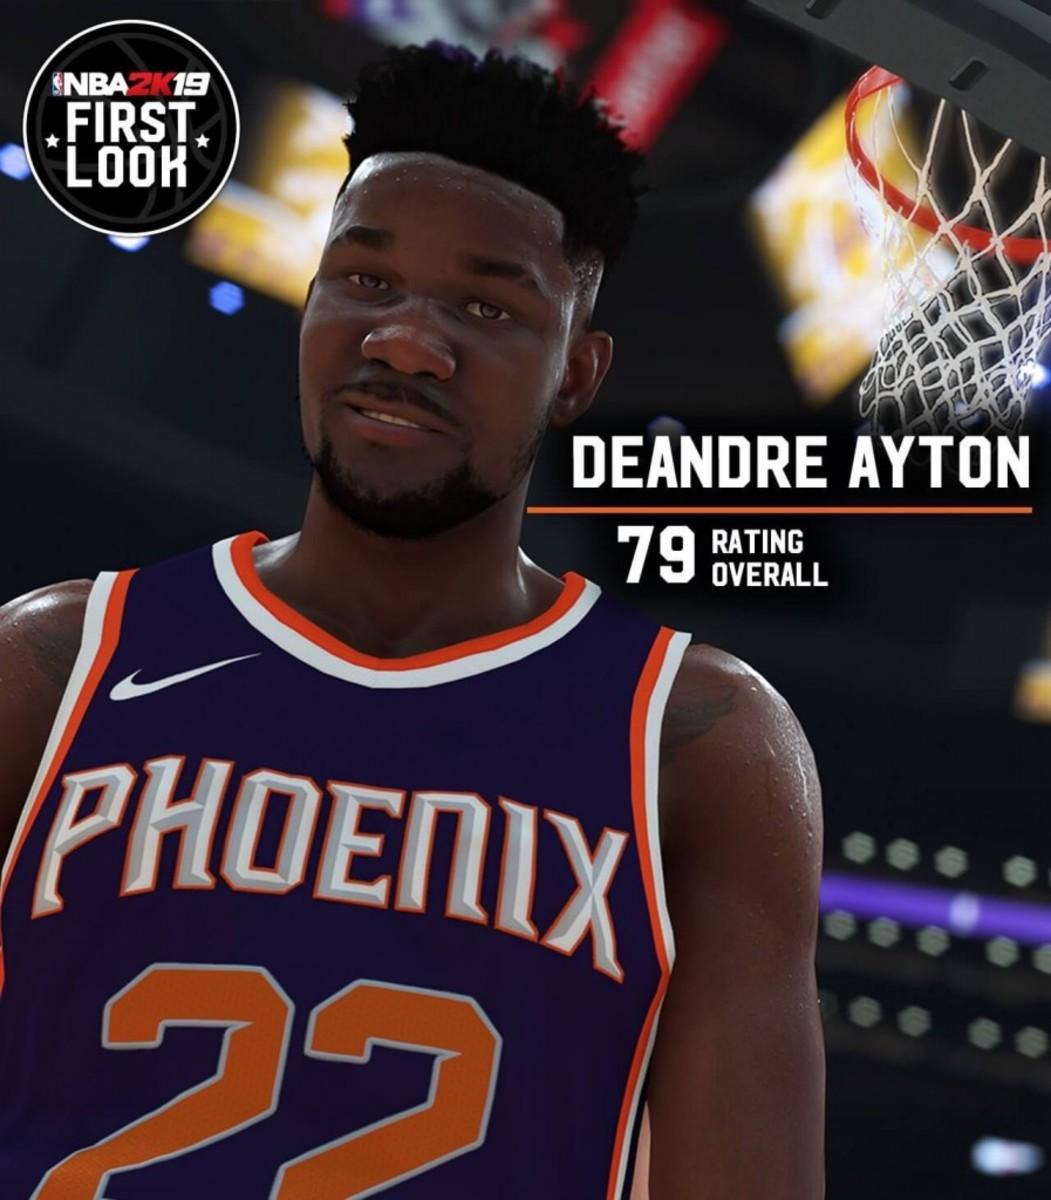 nna-2k19-deandre-ayton